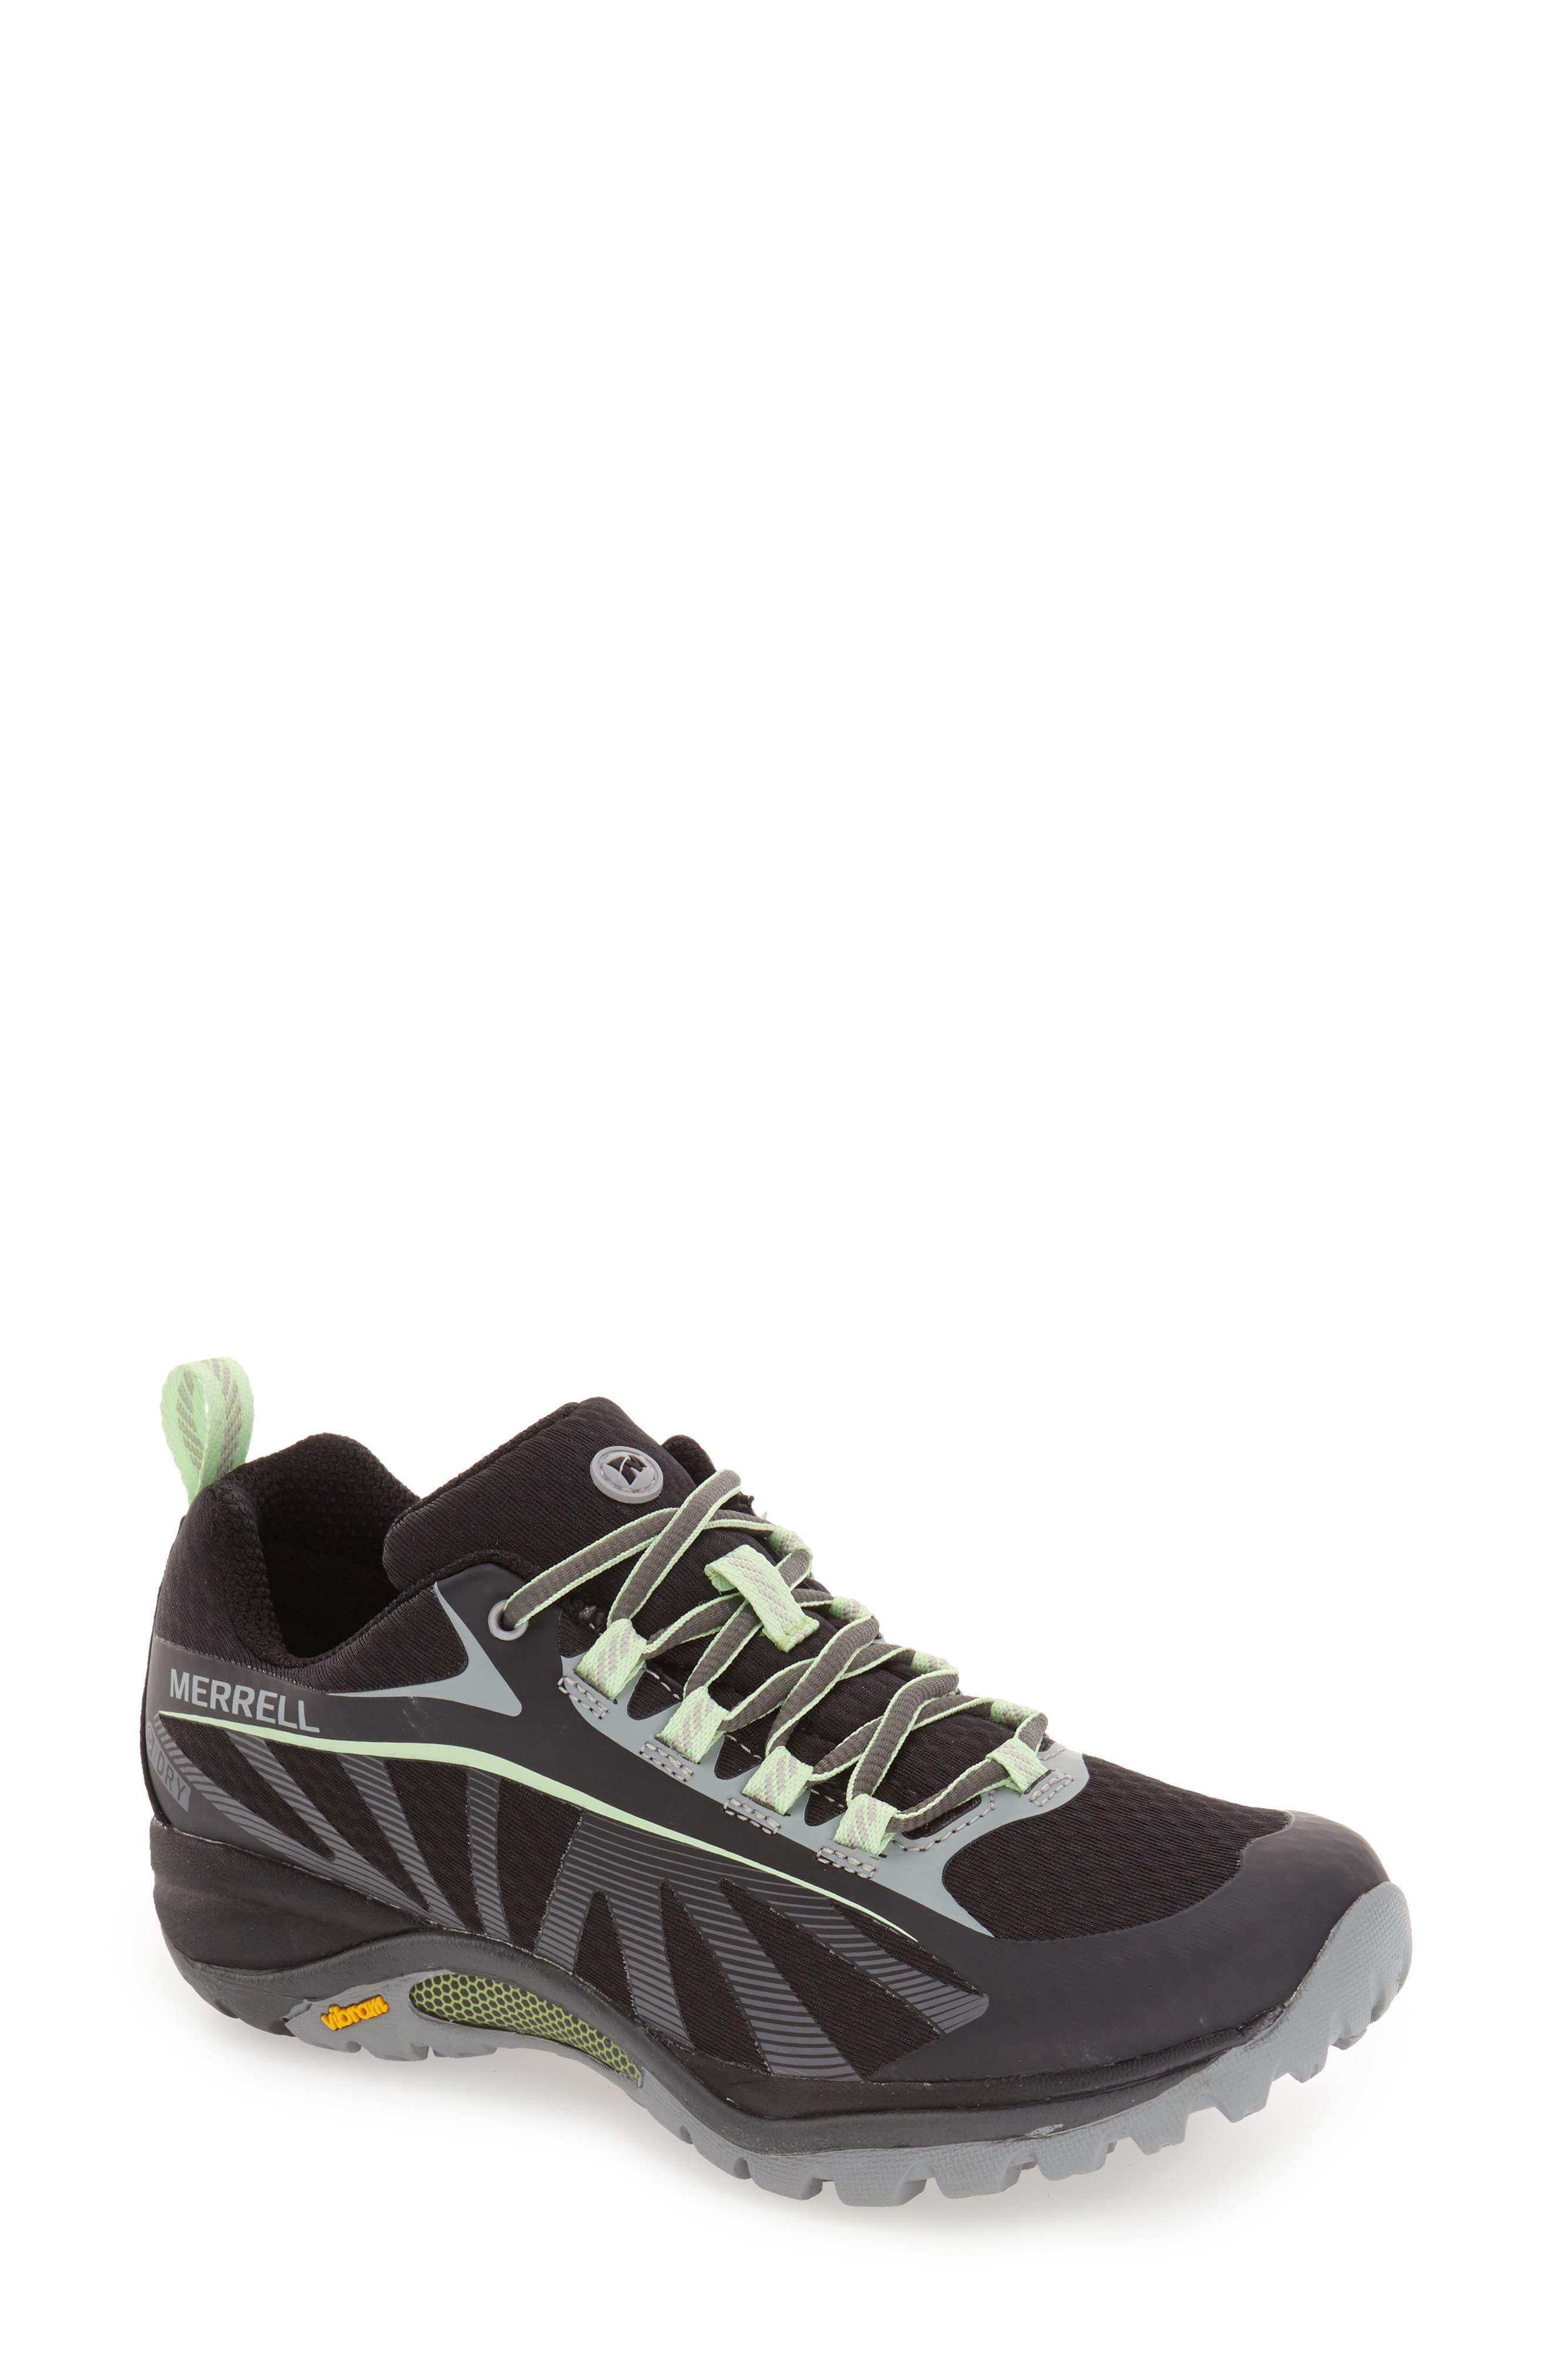 Alternate Image 1 Selected - Merrell Siren Edge Waterproof Hiking Shoe (Women)